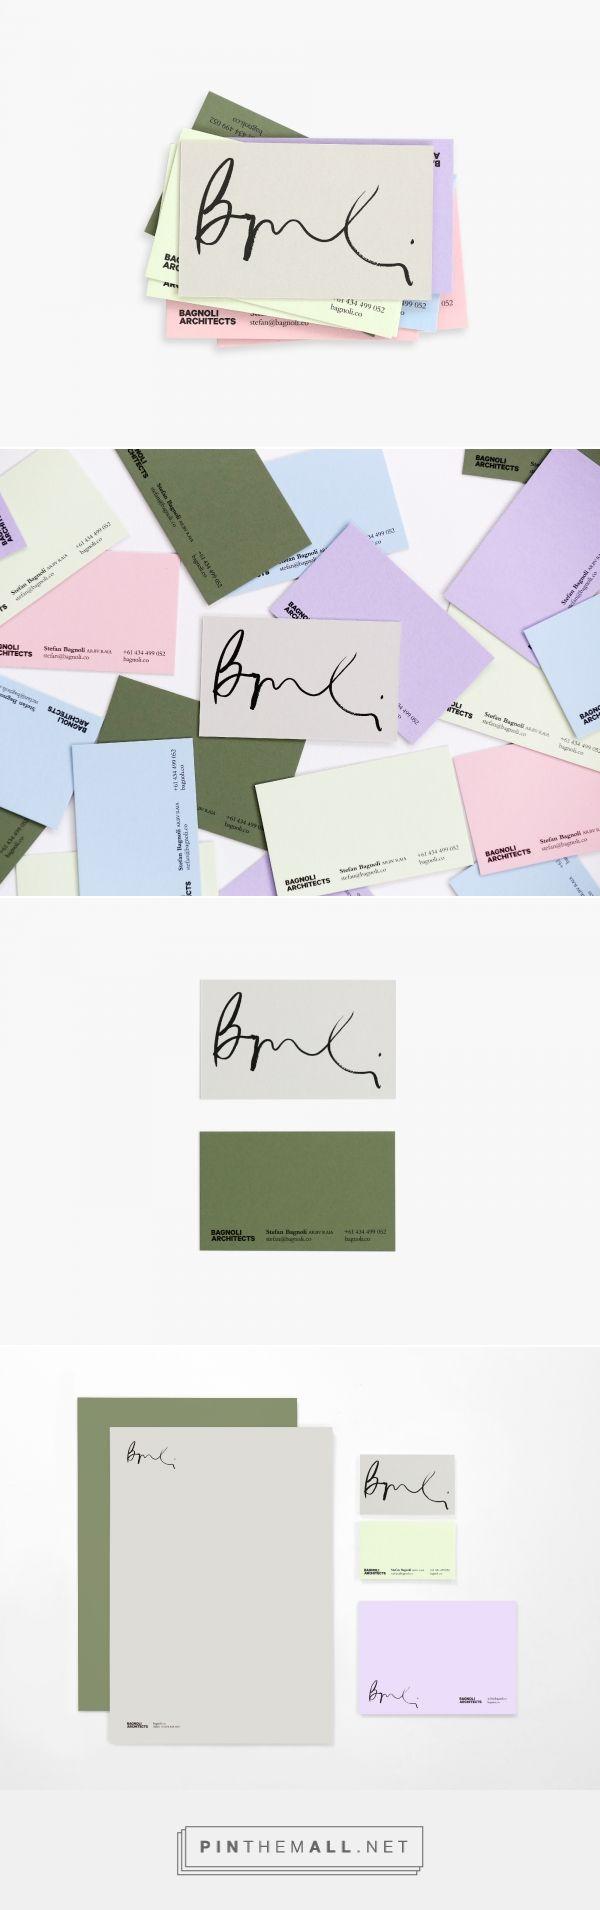 Ortolan : Projects : Branding + Identity : Bagnoli - created via https://pinthemall.net